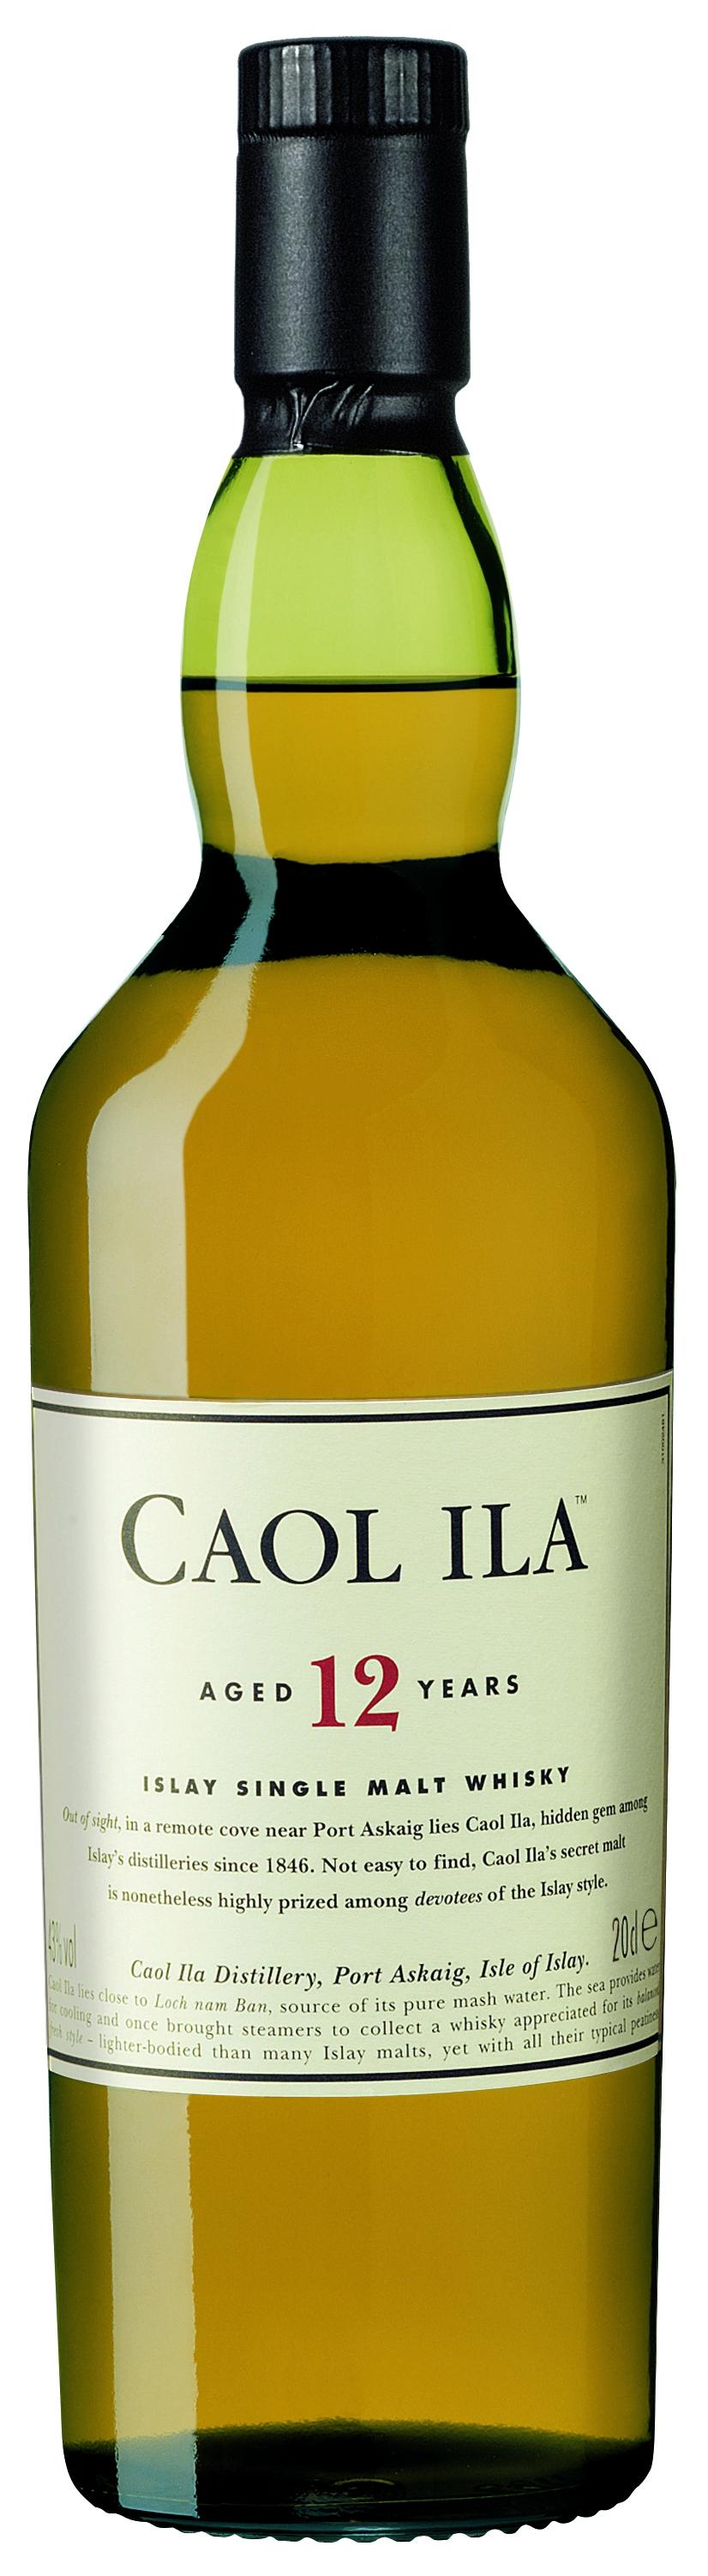 Caol Ila 12 Jahre Whisky Kleinflasche